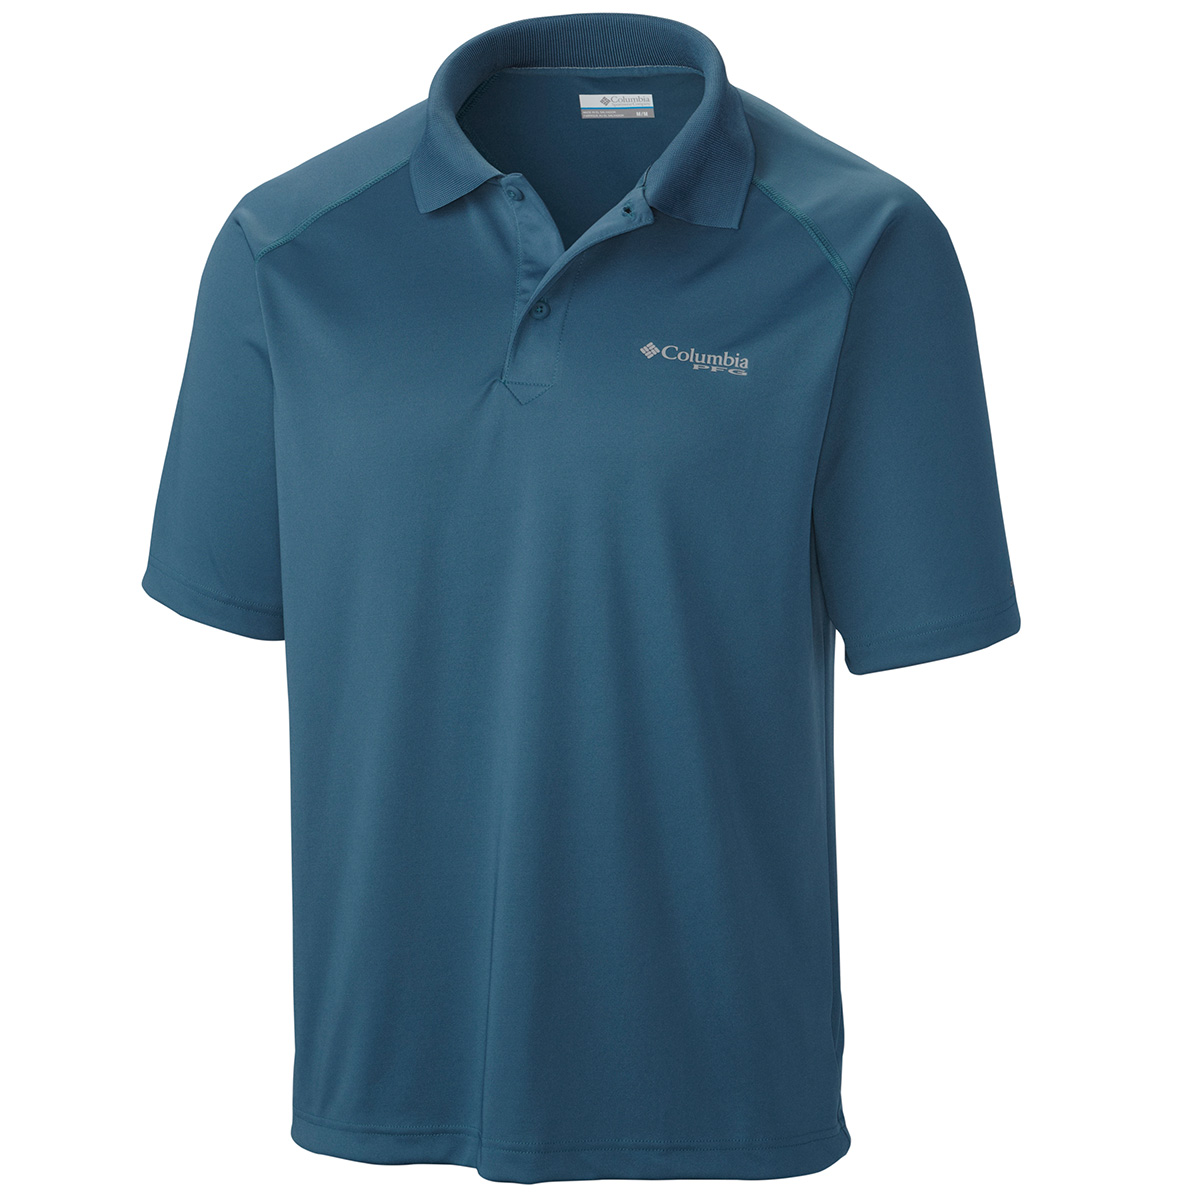 Columbia terminal tackle ss polo shirt fishing tshirt for Fly fishing sun shirt